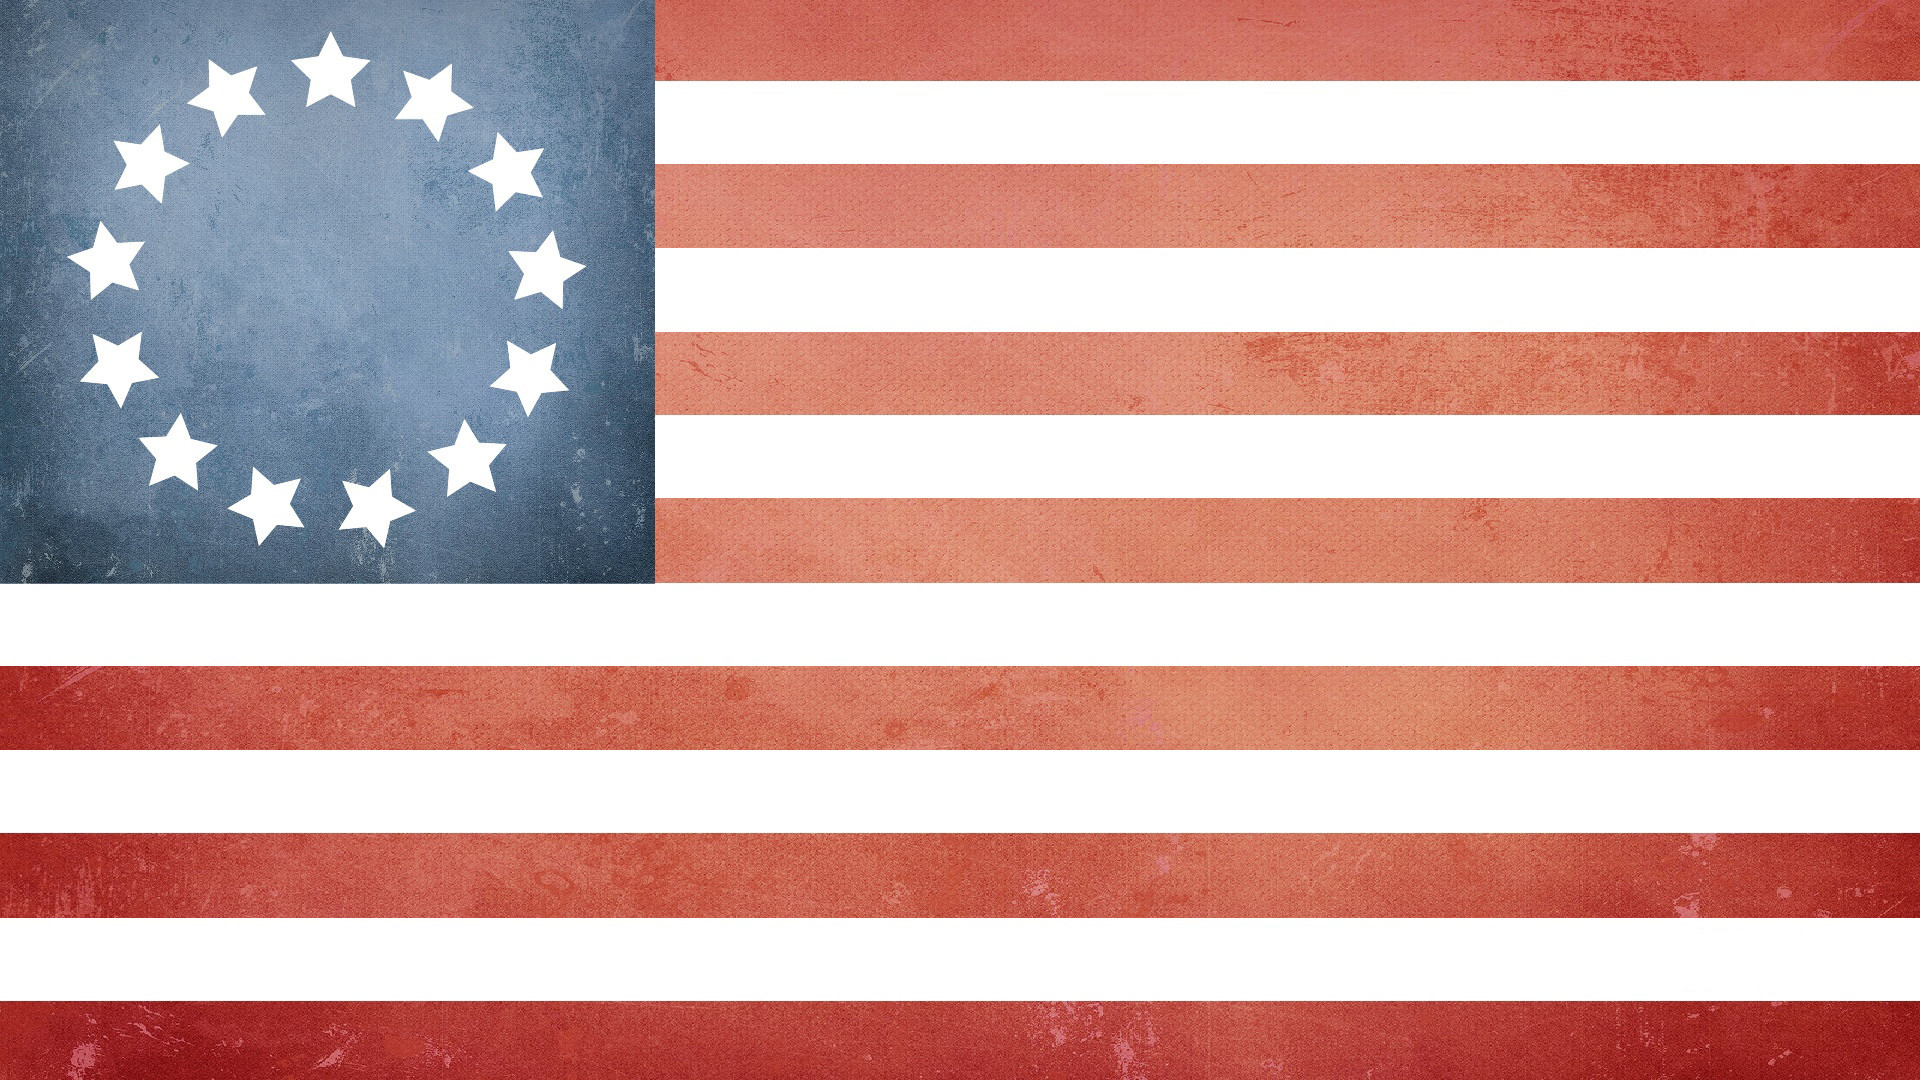 American Flag HD Desktop Wallpapers | Live HD Wallpaper HQ Pictures .